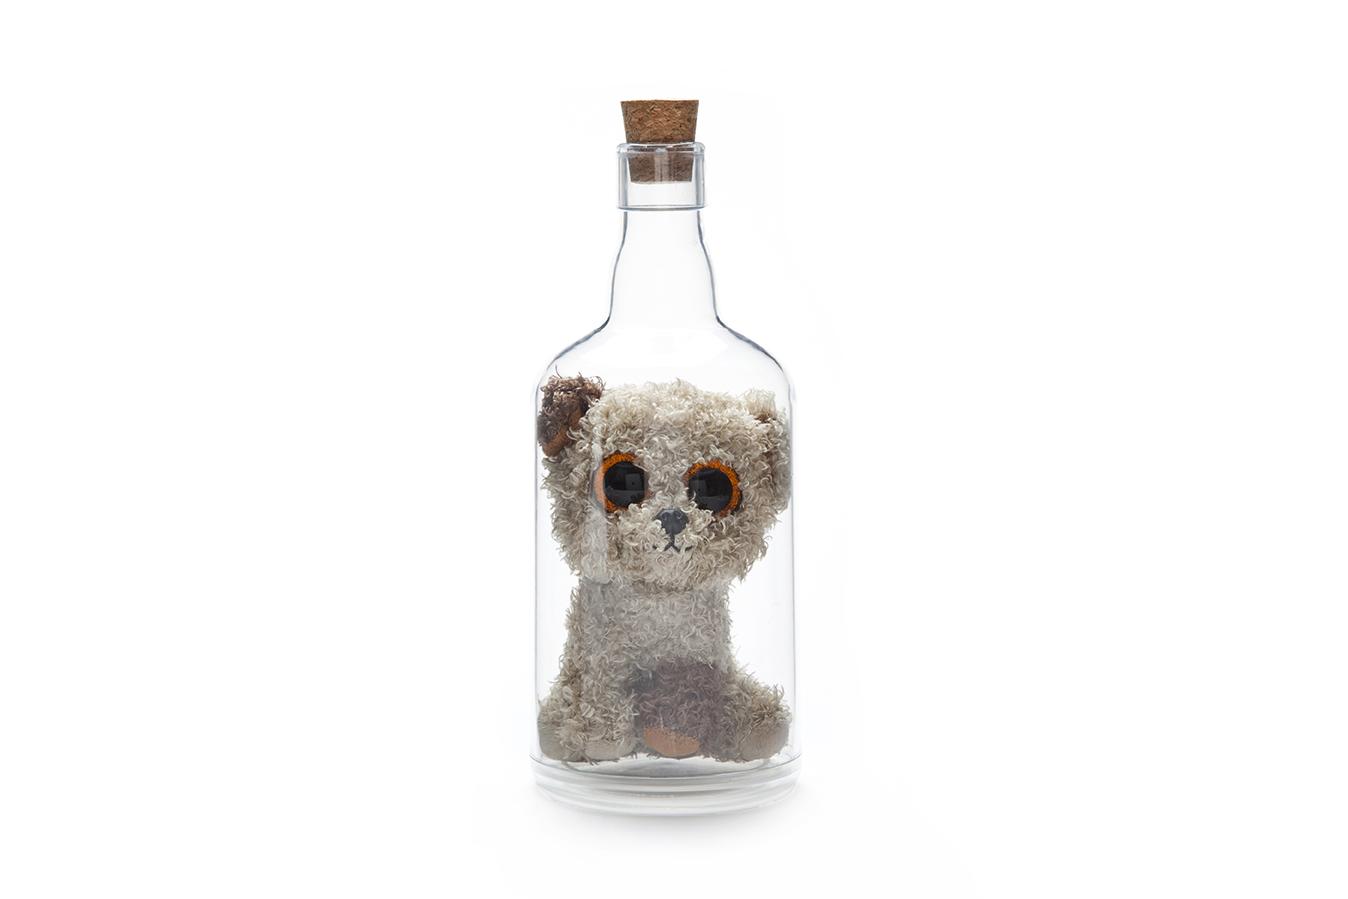 Peleg-impossible bottle_72dpi_ (8)